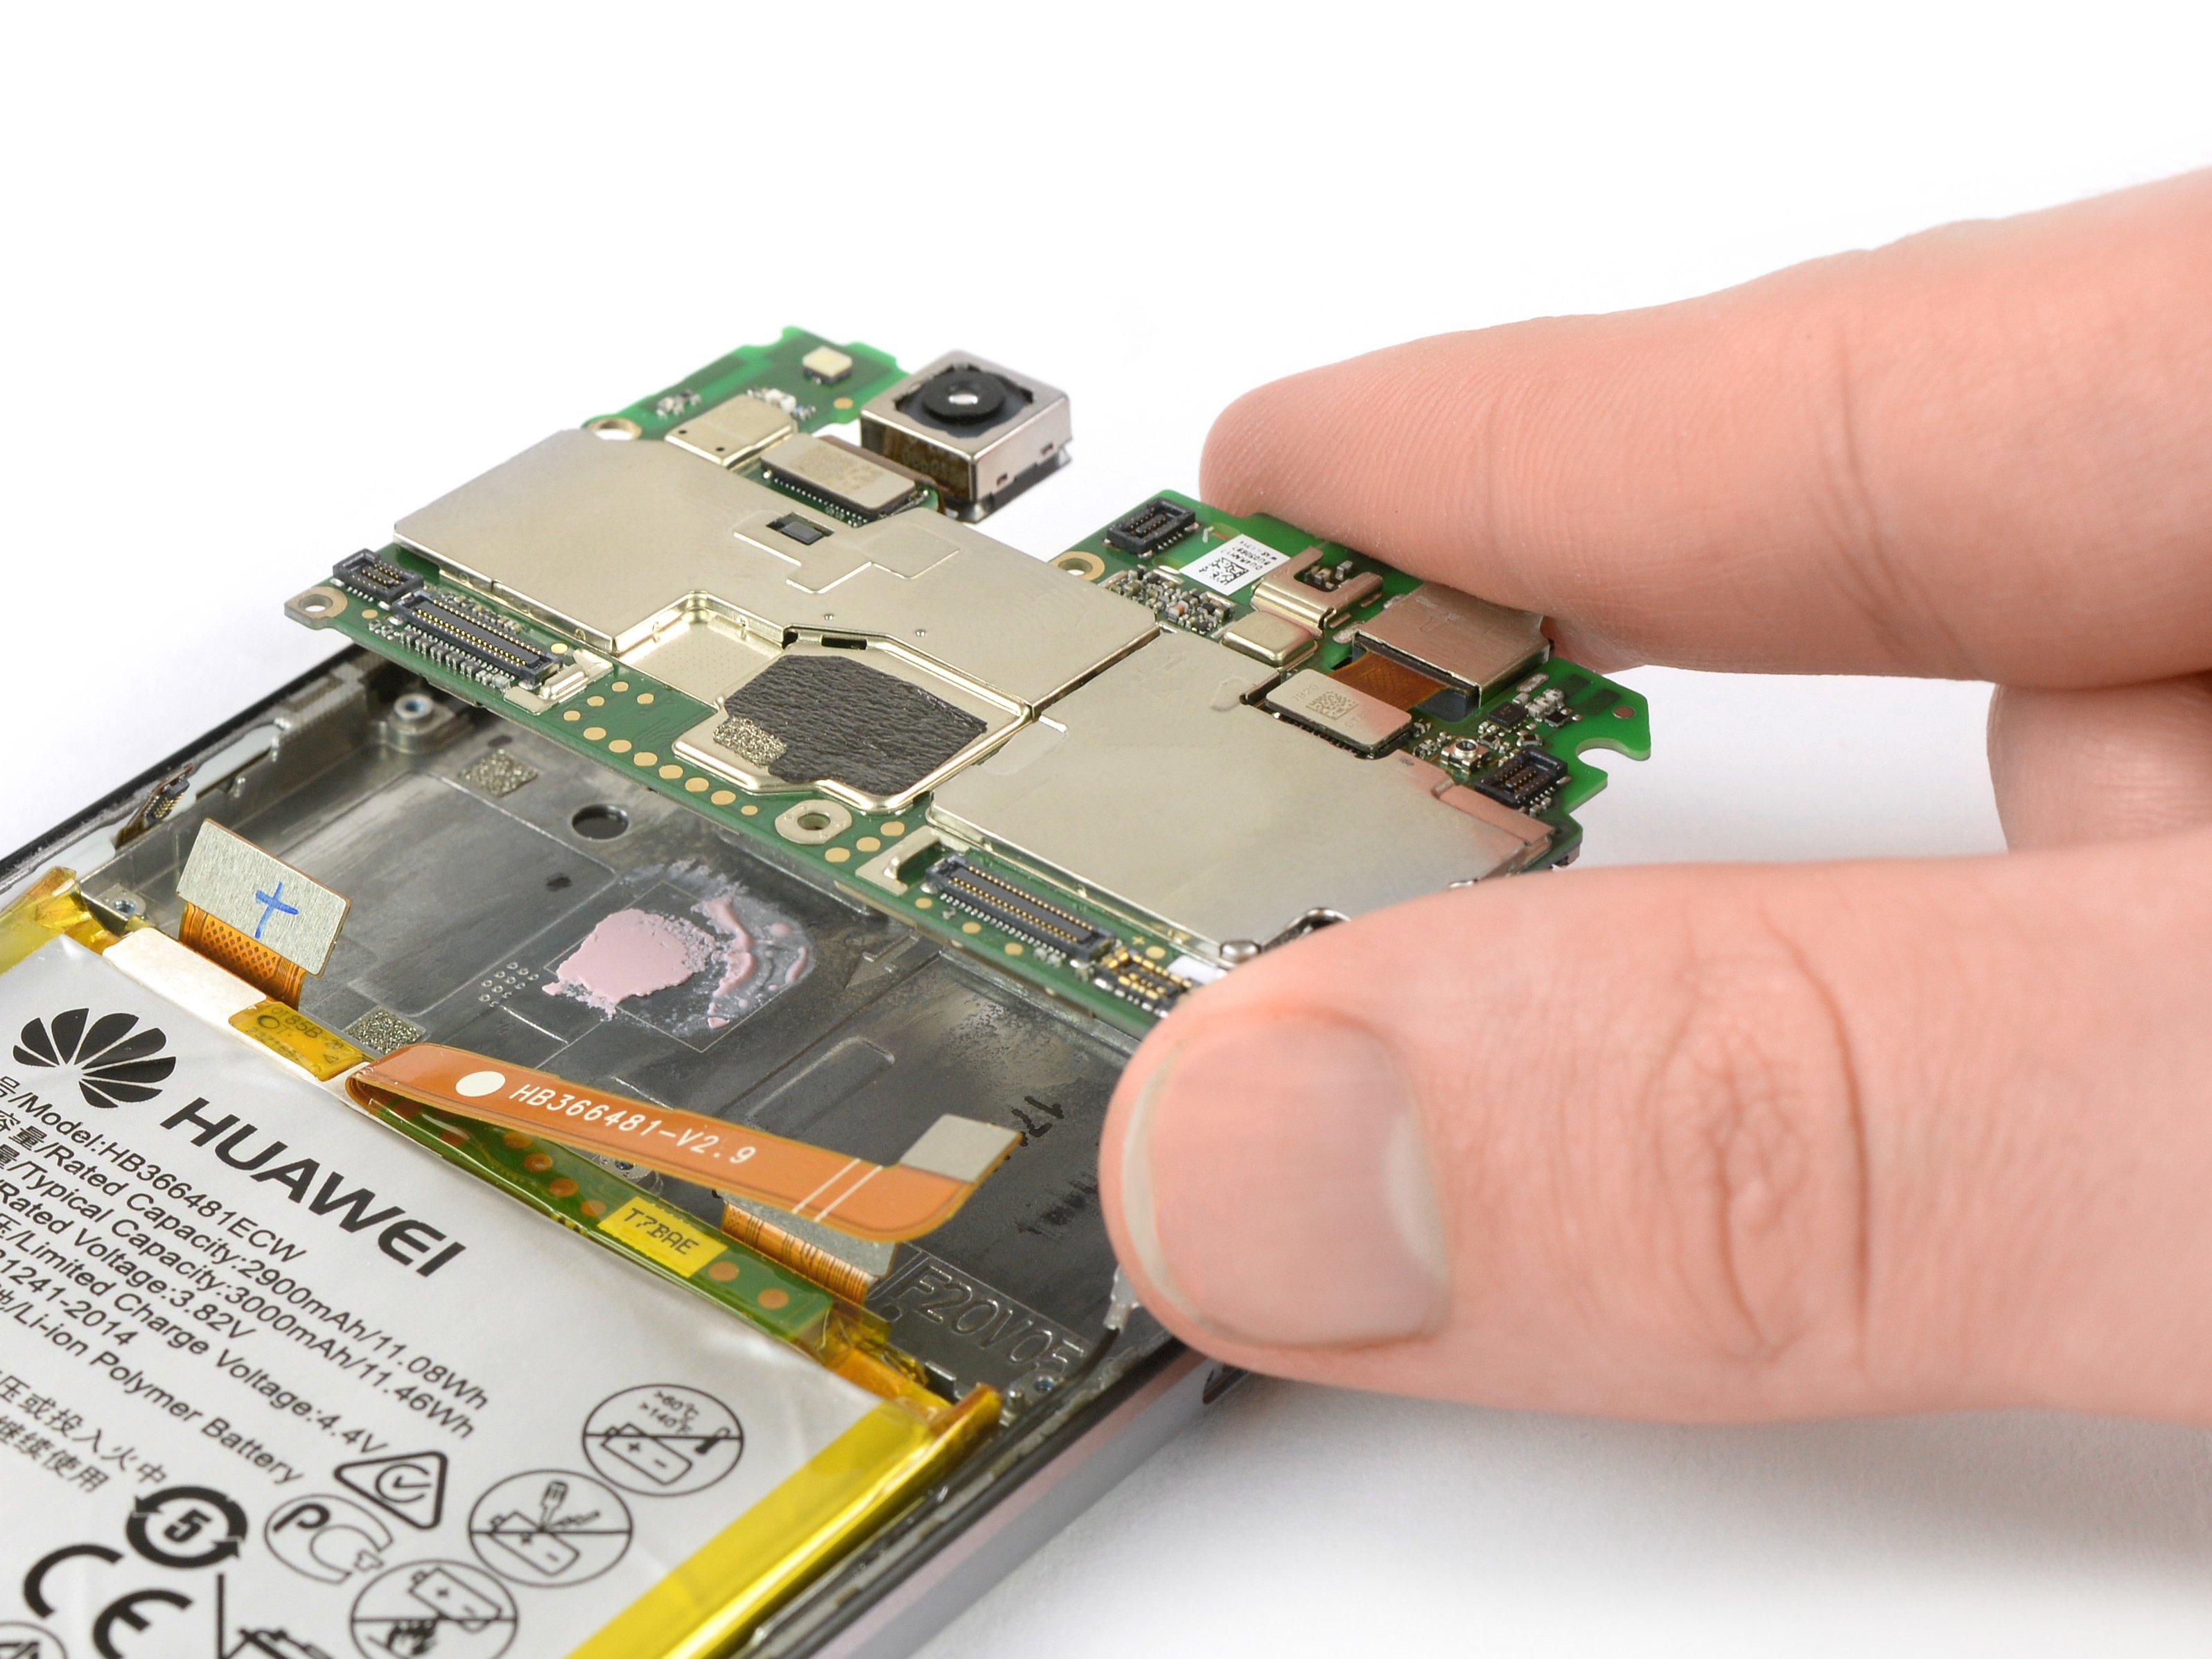 Schemi Elettrici Huawei : Huawei p10 lite motherboard replacement ifixit repair guide